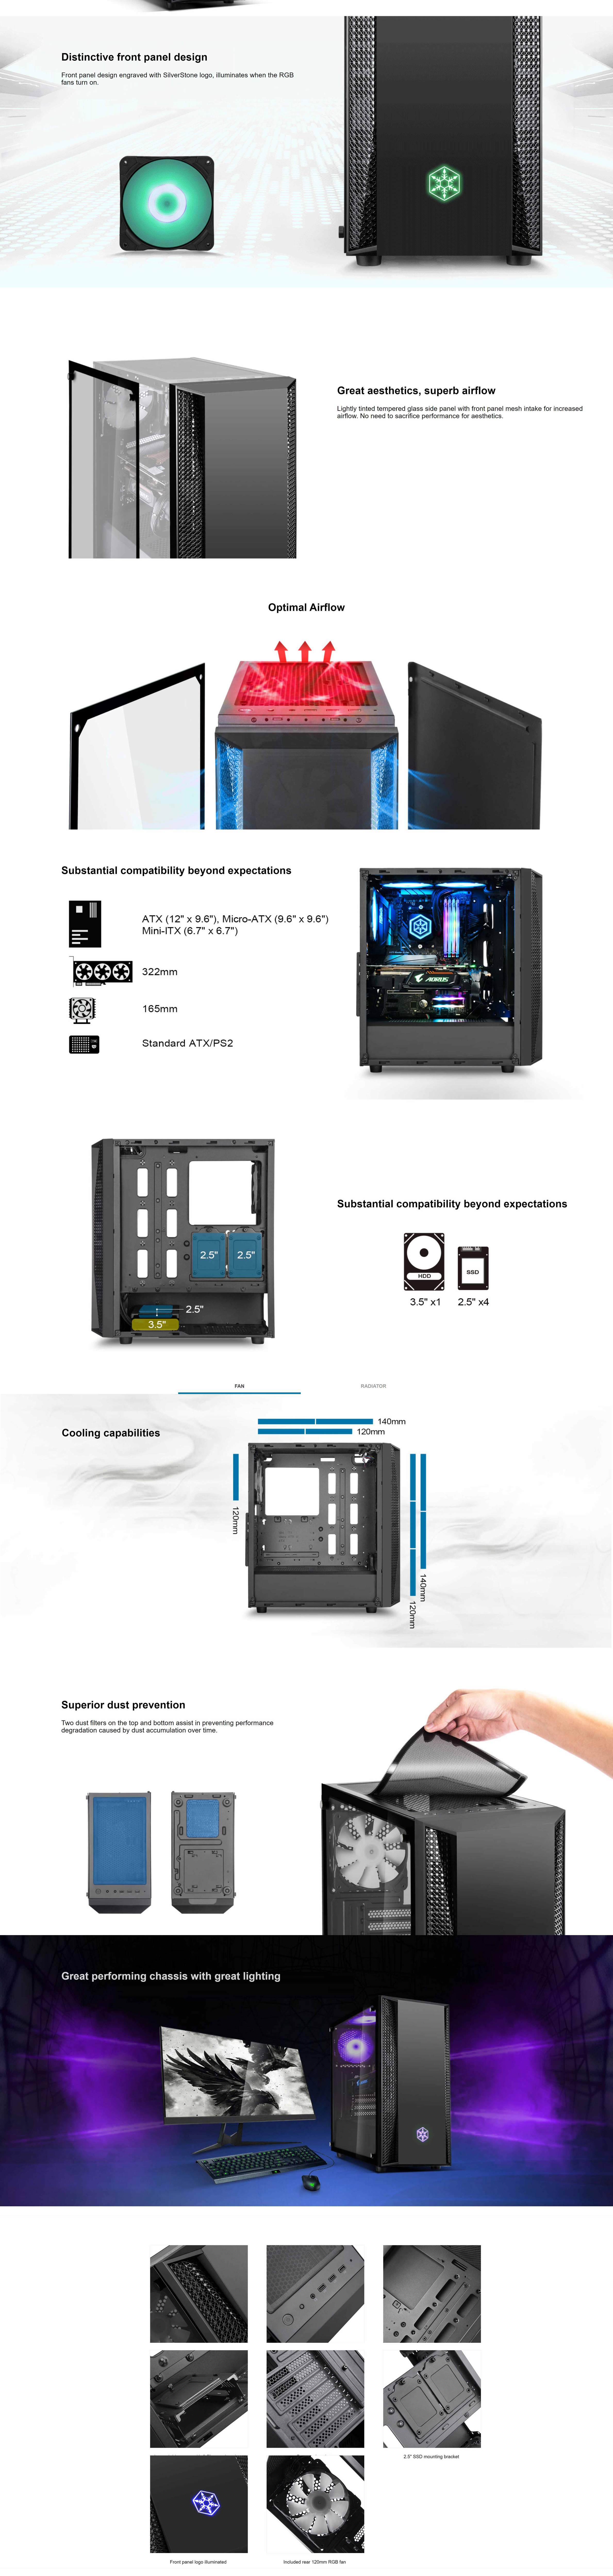 screencapture-silverstonetek-product-php-2020-01-09-12_39_17.jpg